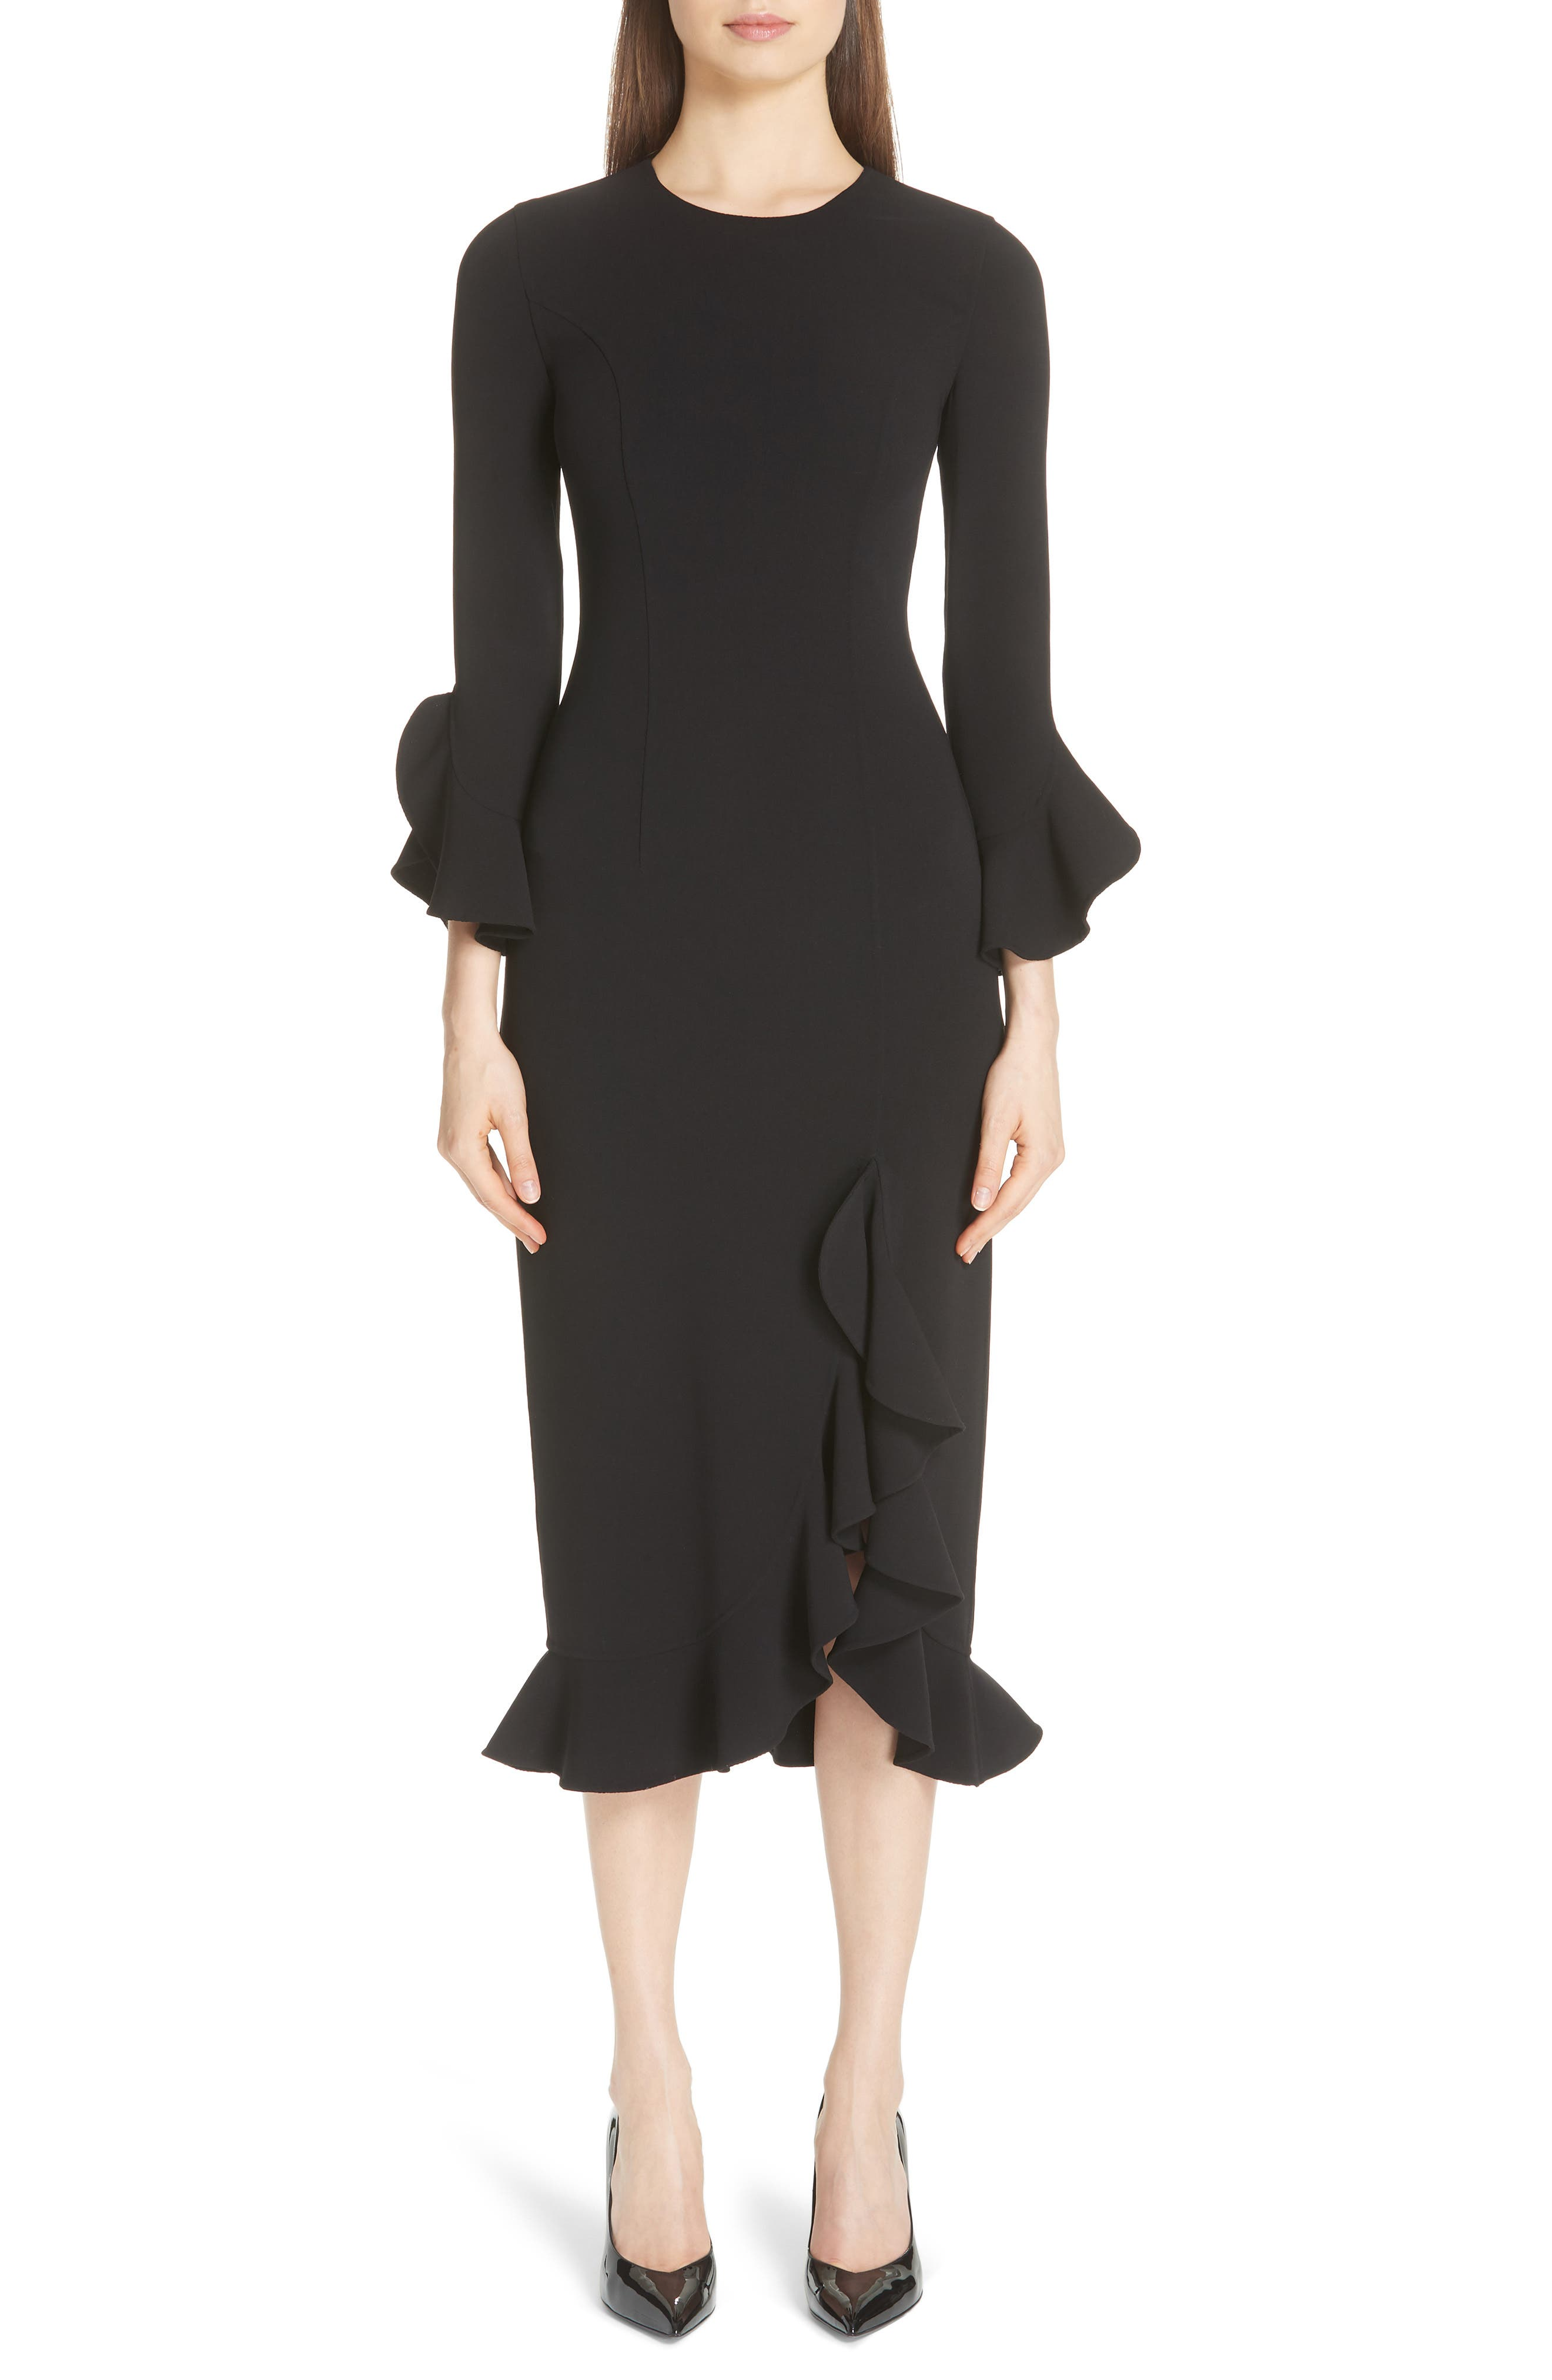 Michael Kors Rumba Ruffle Trim Stretch Wool Dress, Black